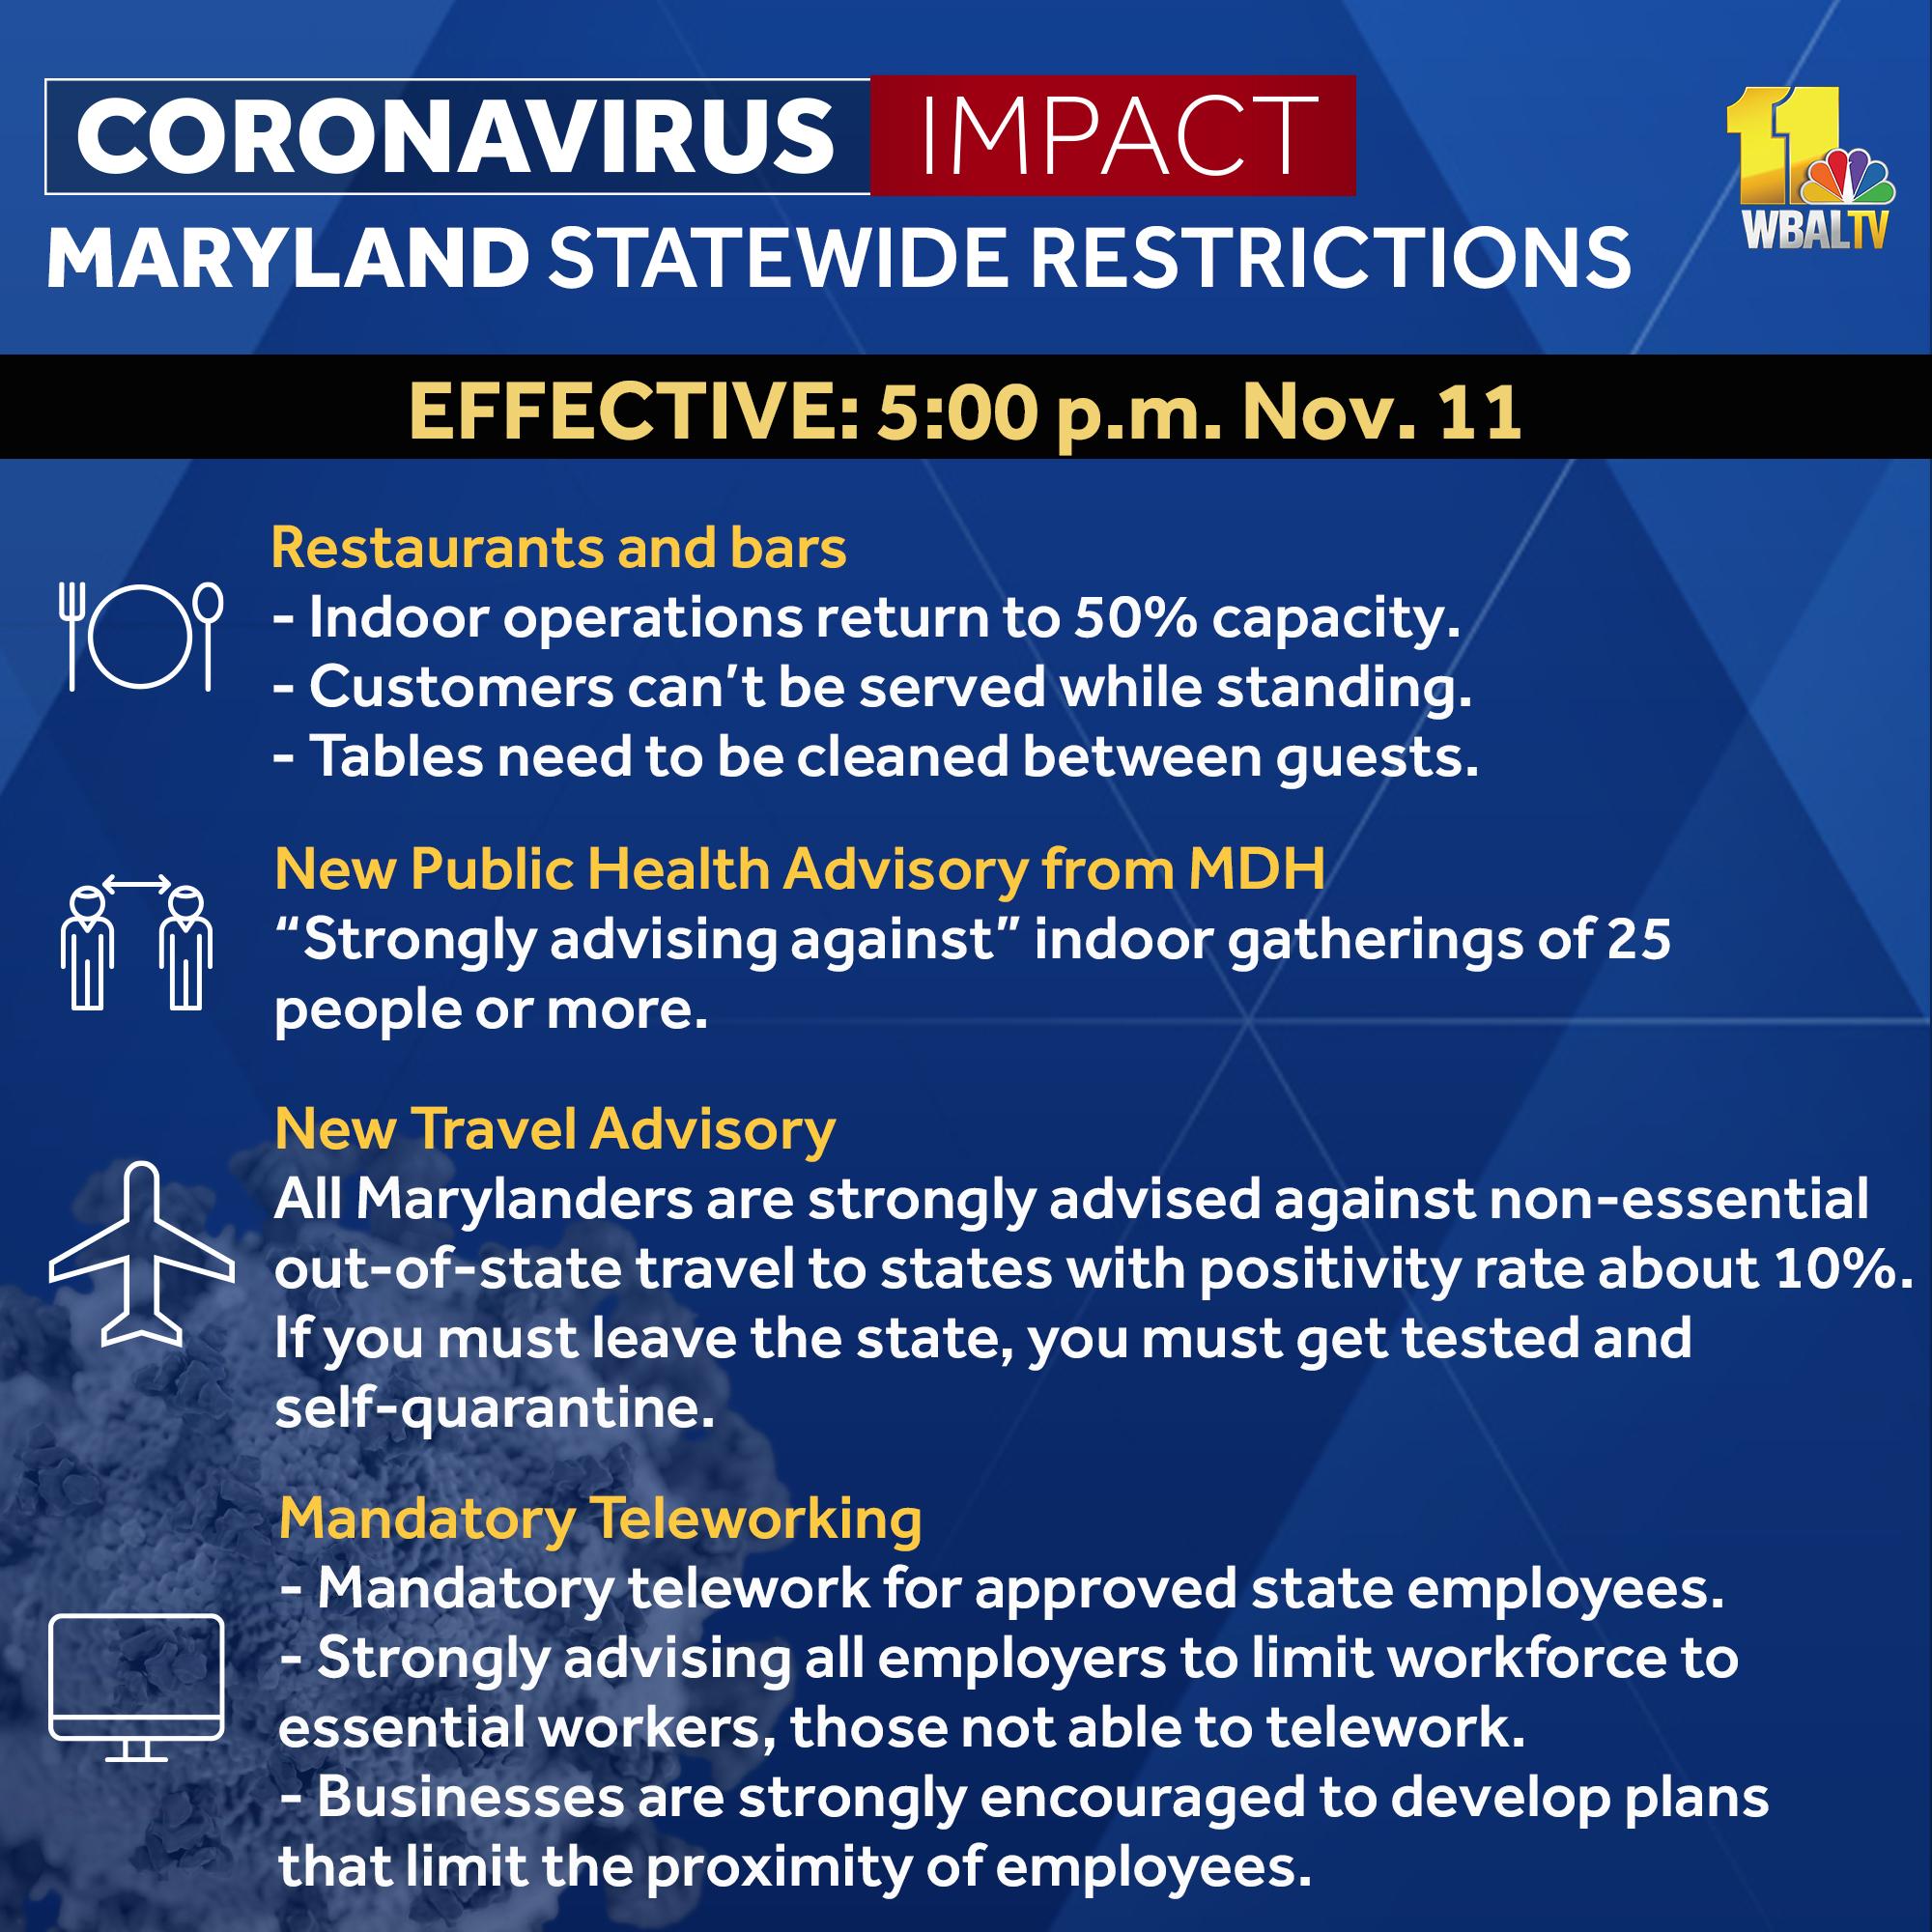 Wbal Tv 11 Baltimore On Twitter Maryland Govlarryhogan Announces Renewed Coronavirus Restrictions To Take Effect At 5 P M Wednesday Https T Co Oxqye1clut Https T Co Dhgpbwzgvt